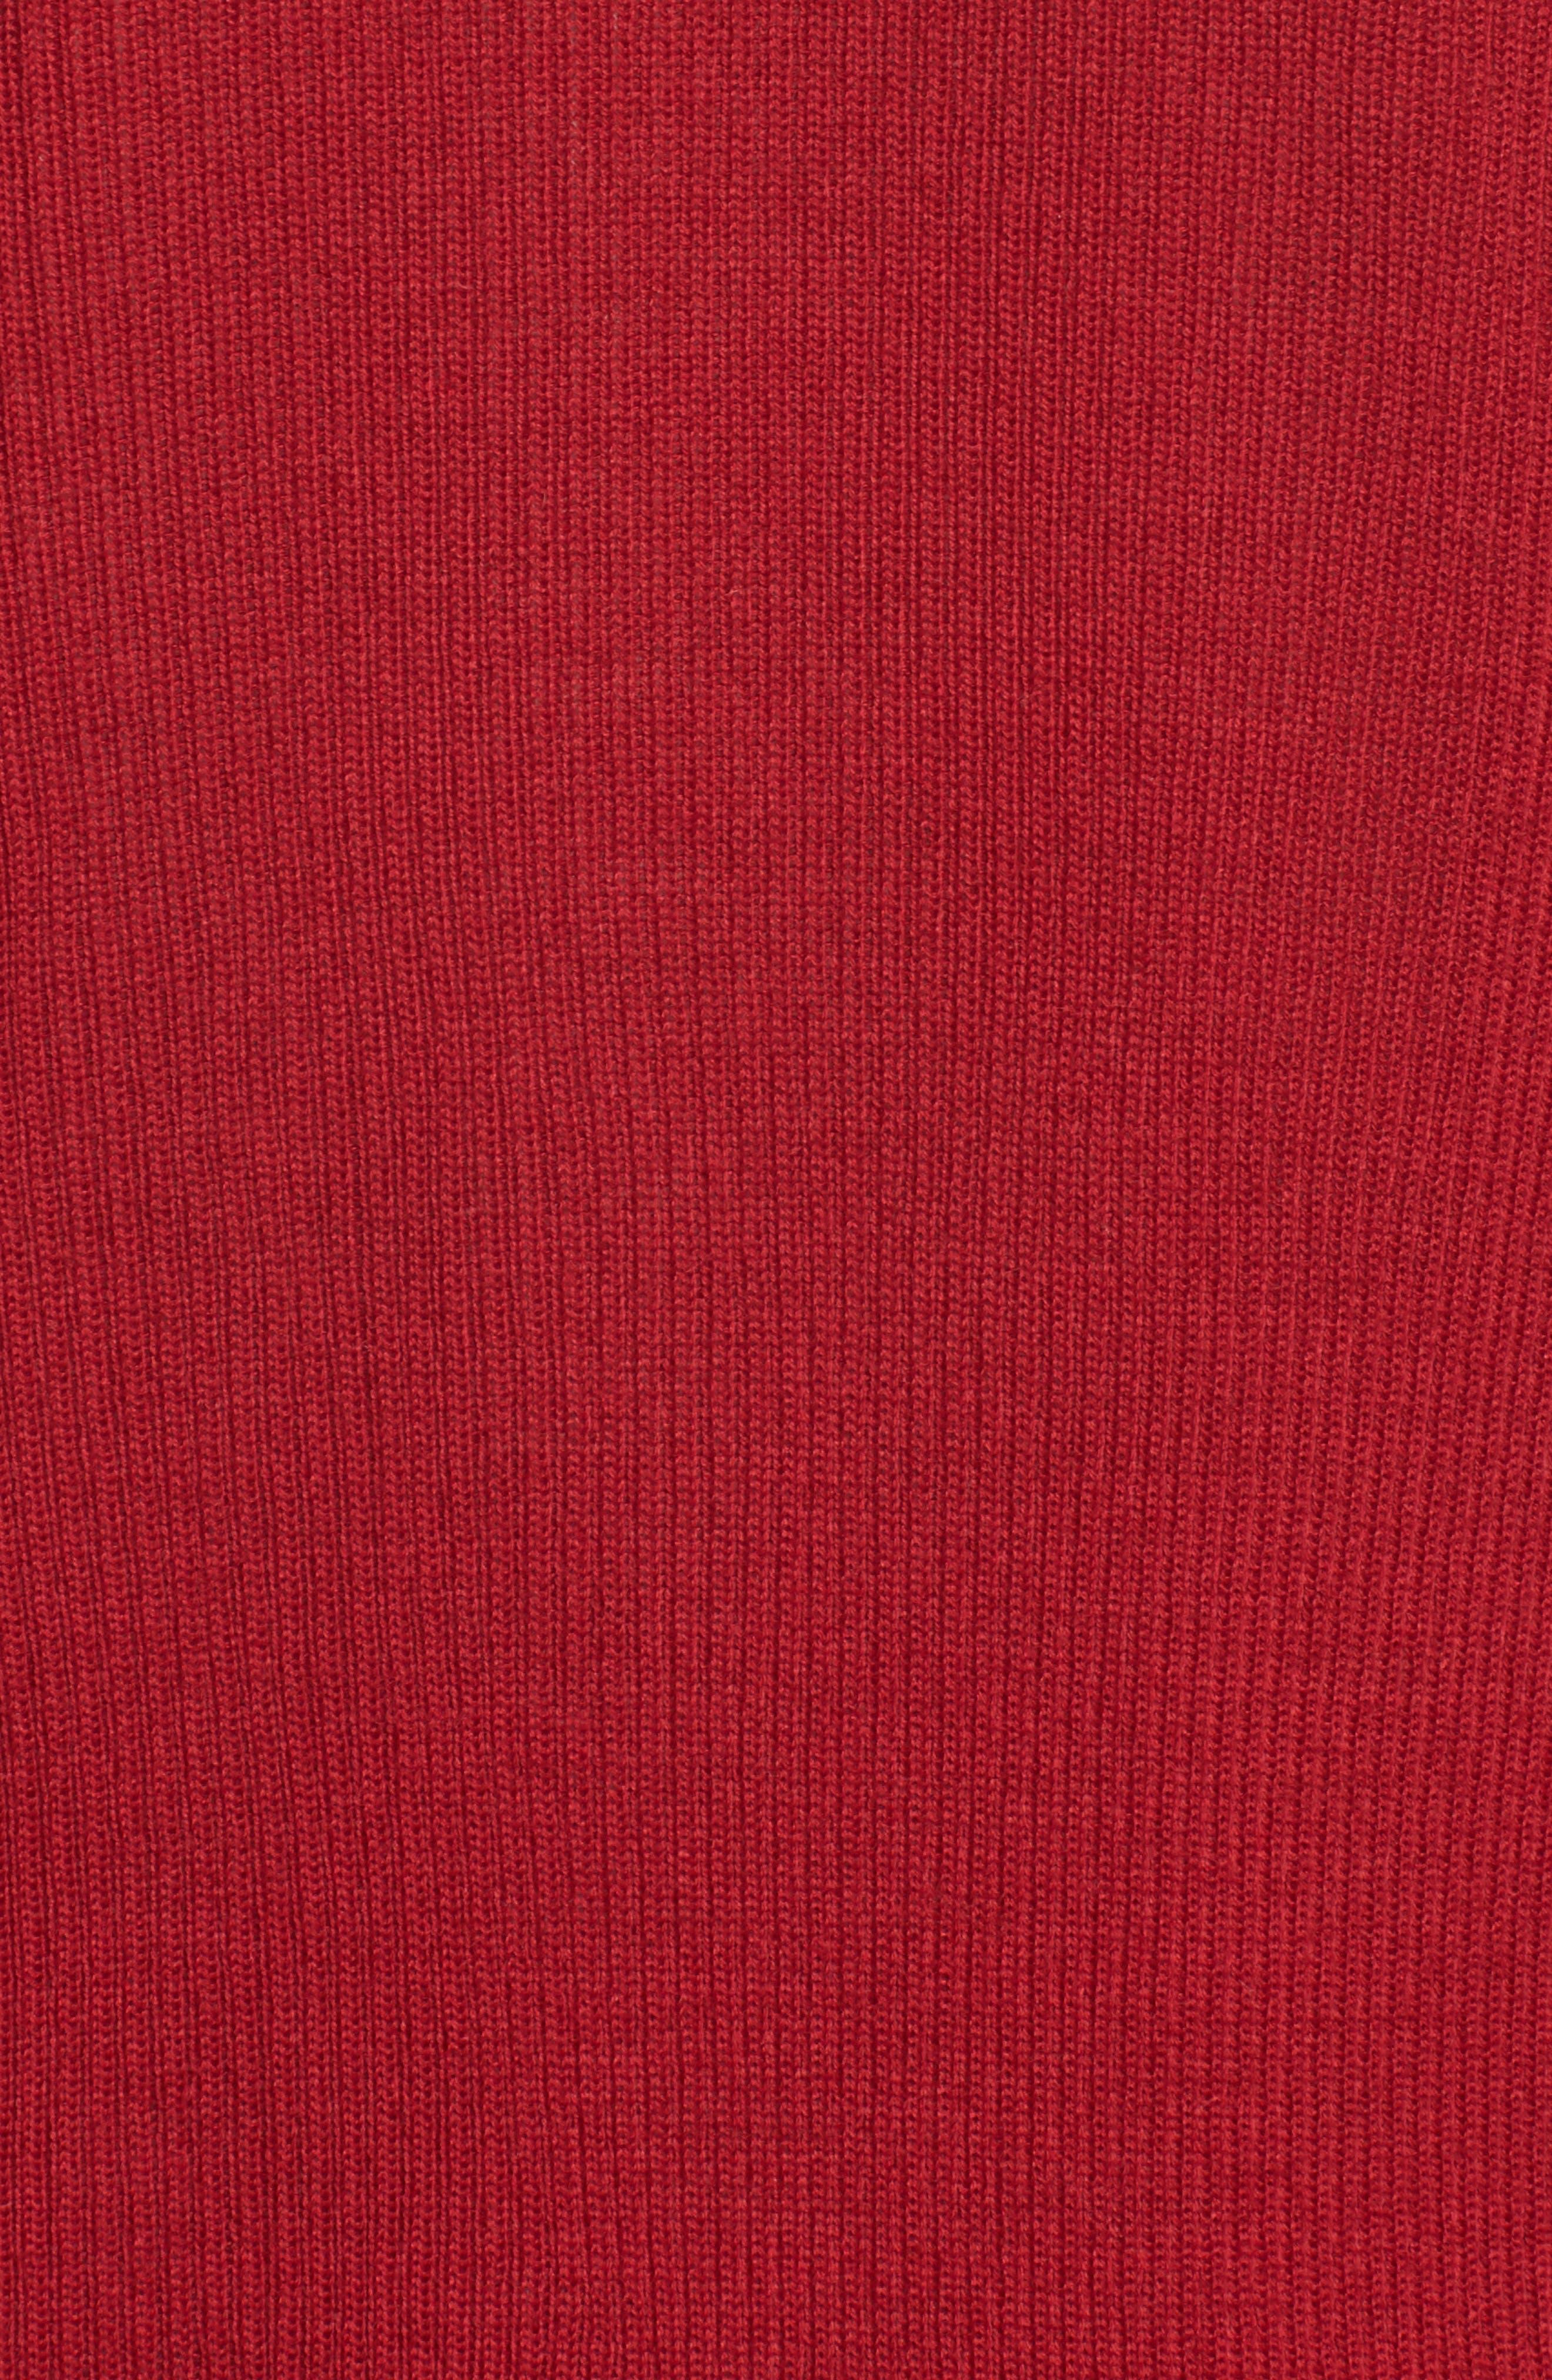 Rib Knit Wool Blend Cardigan,                             Alternate thumbnail 96, color,